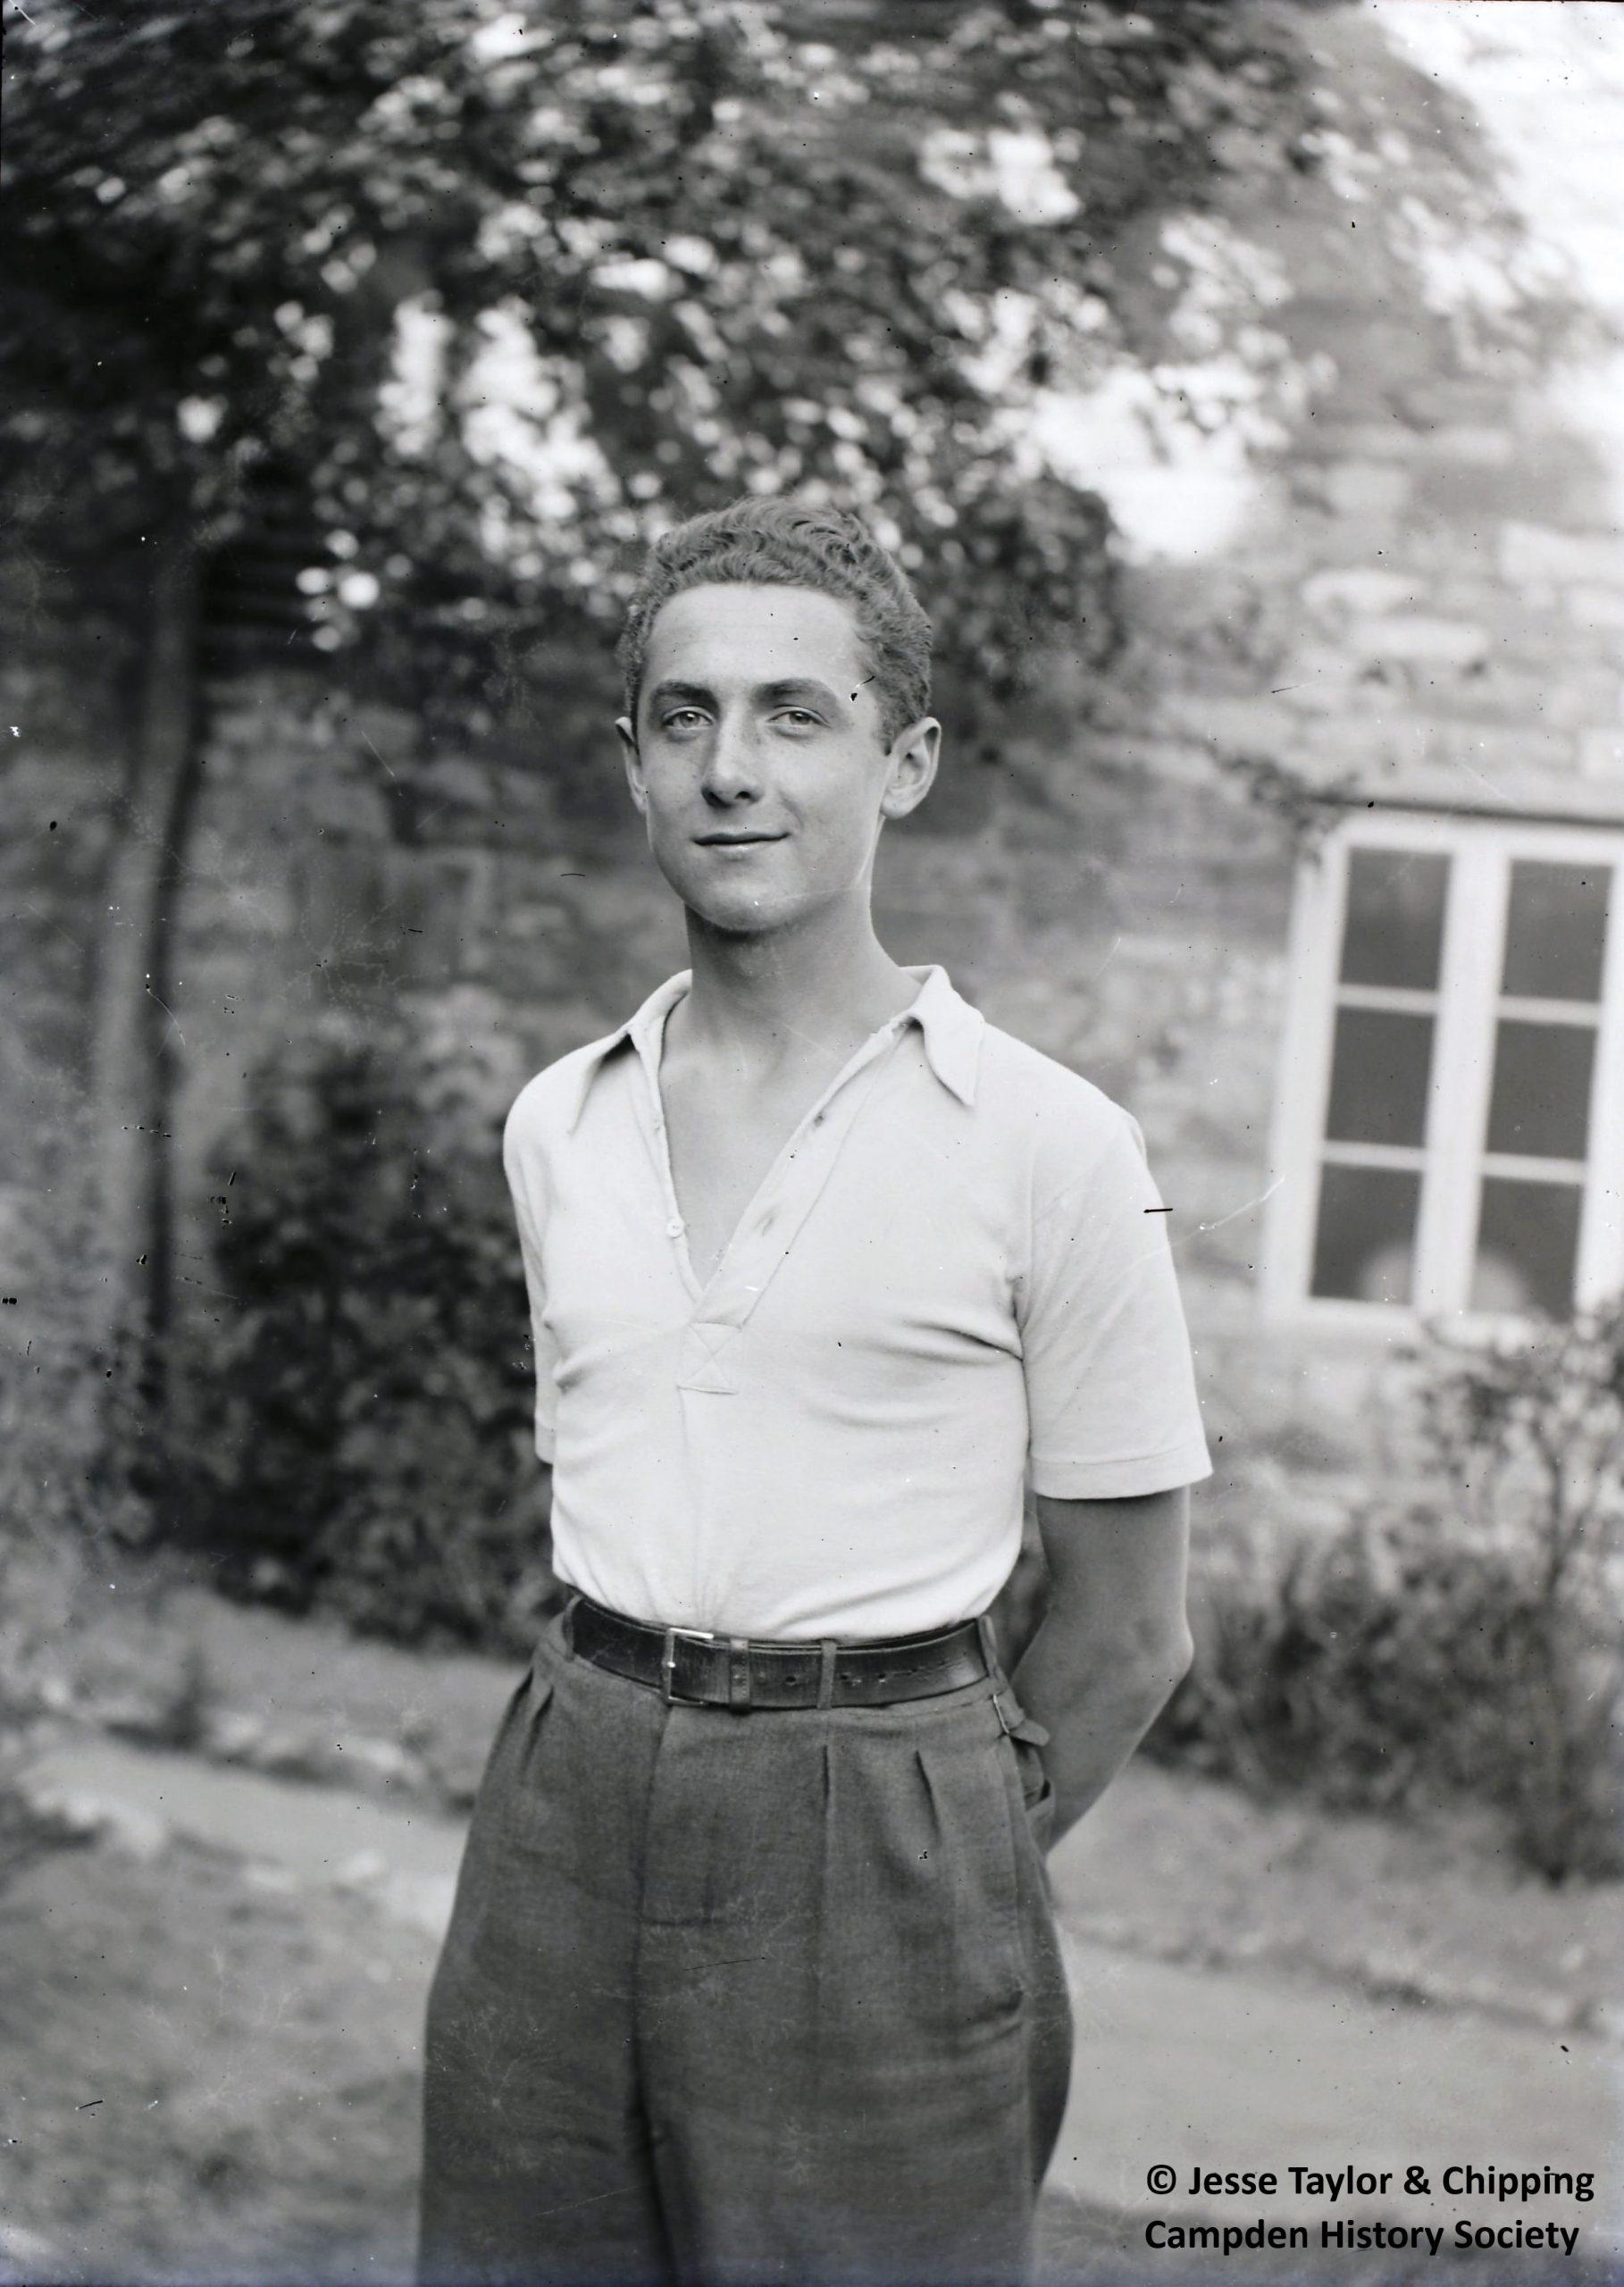 Portrait of POW at Broad Martson